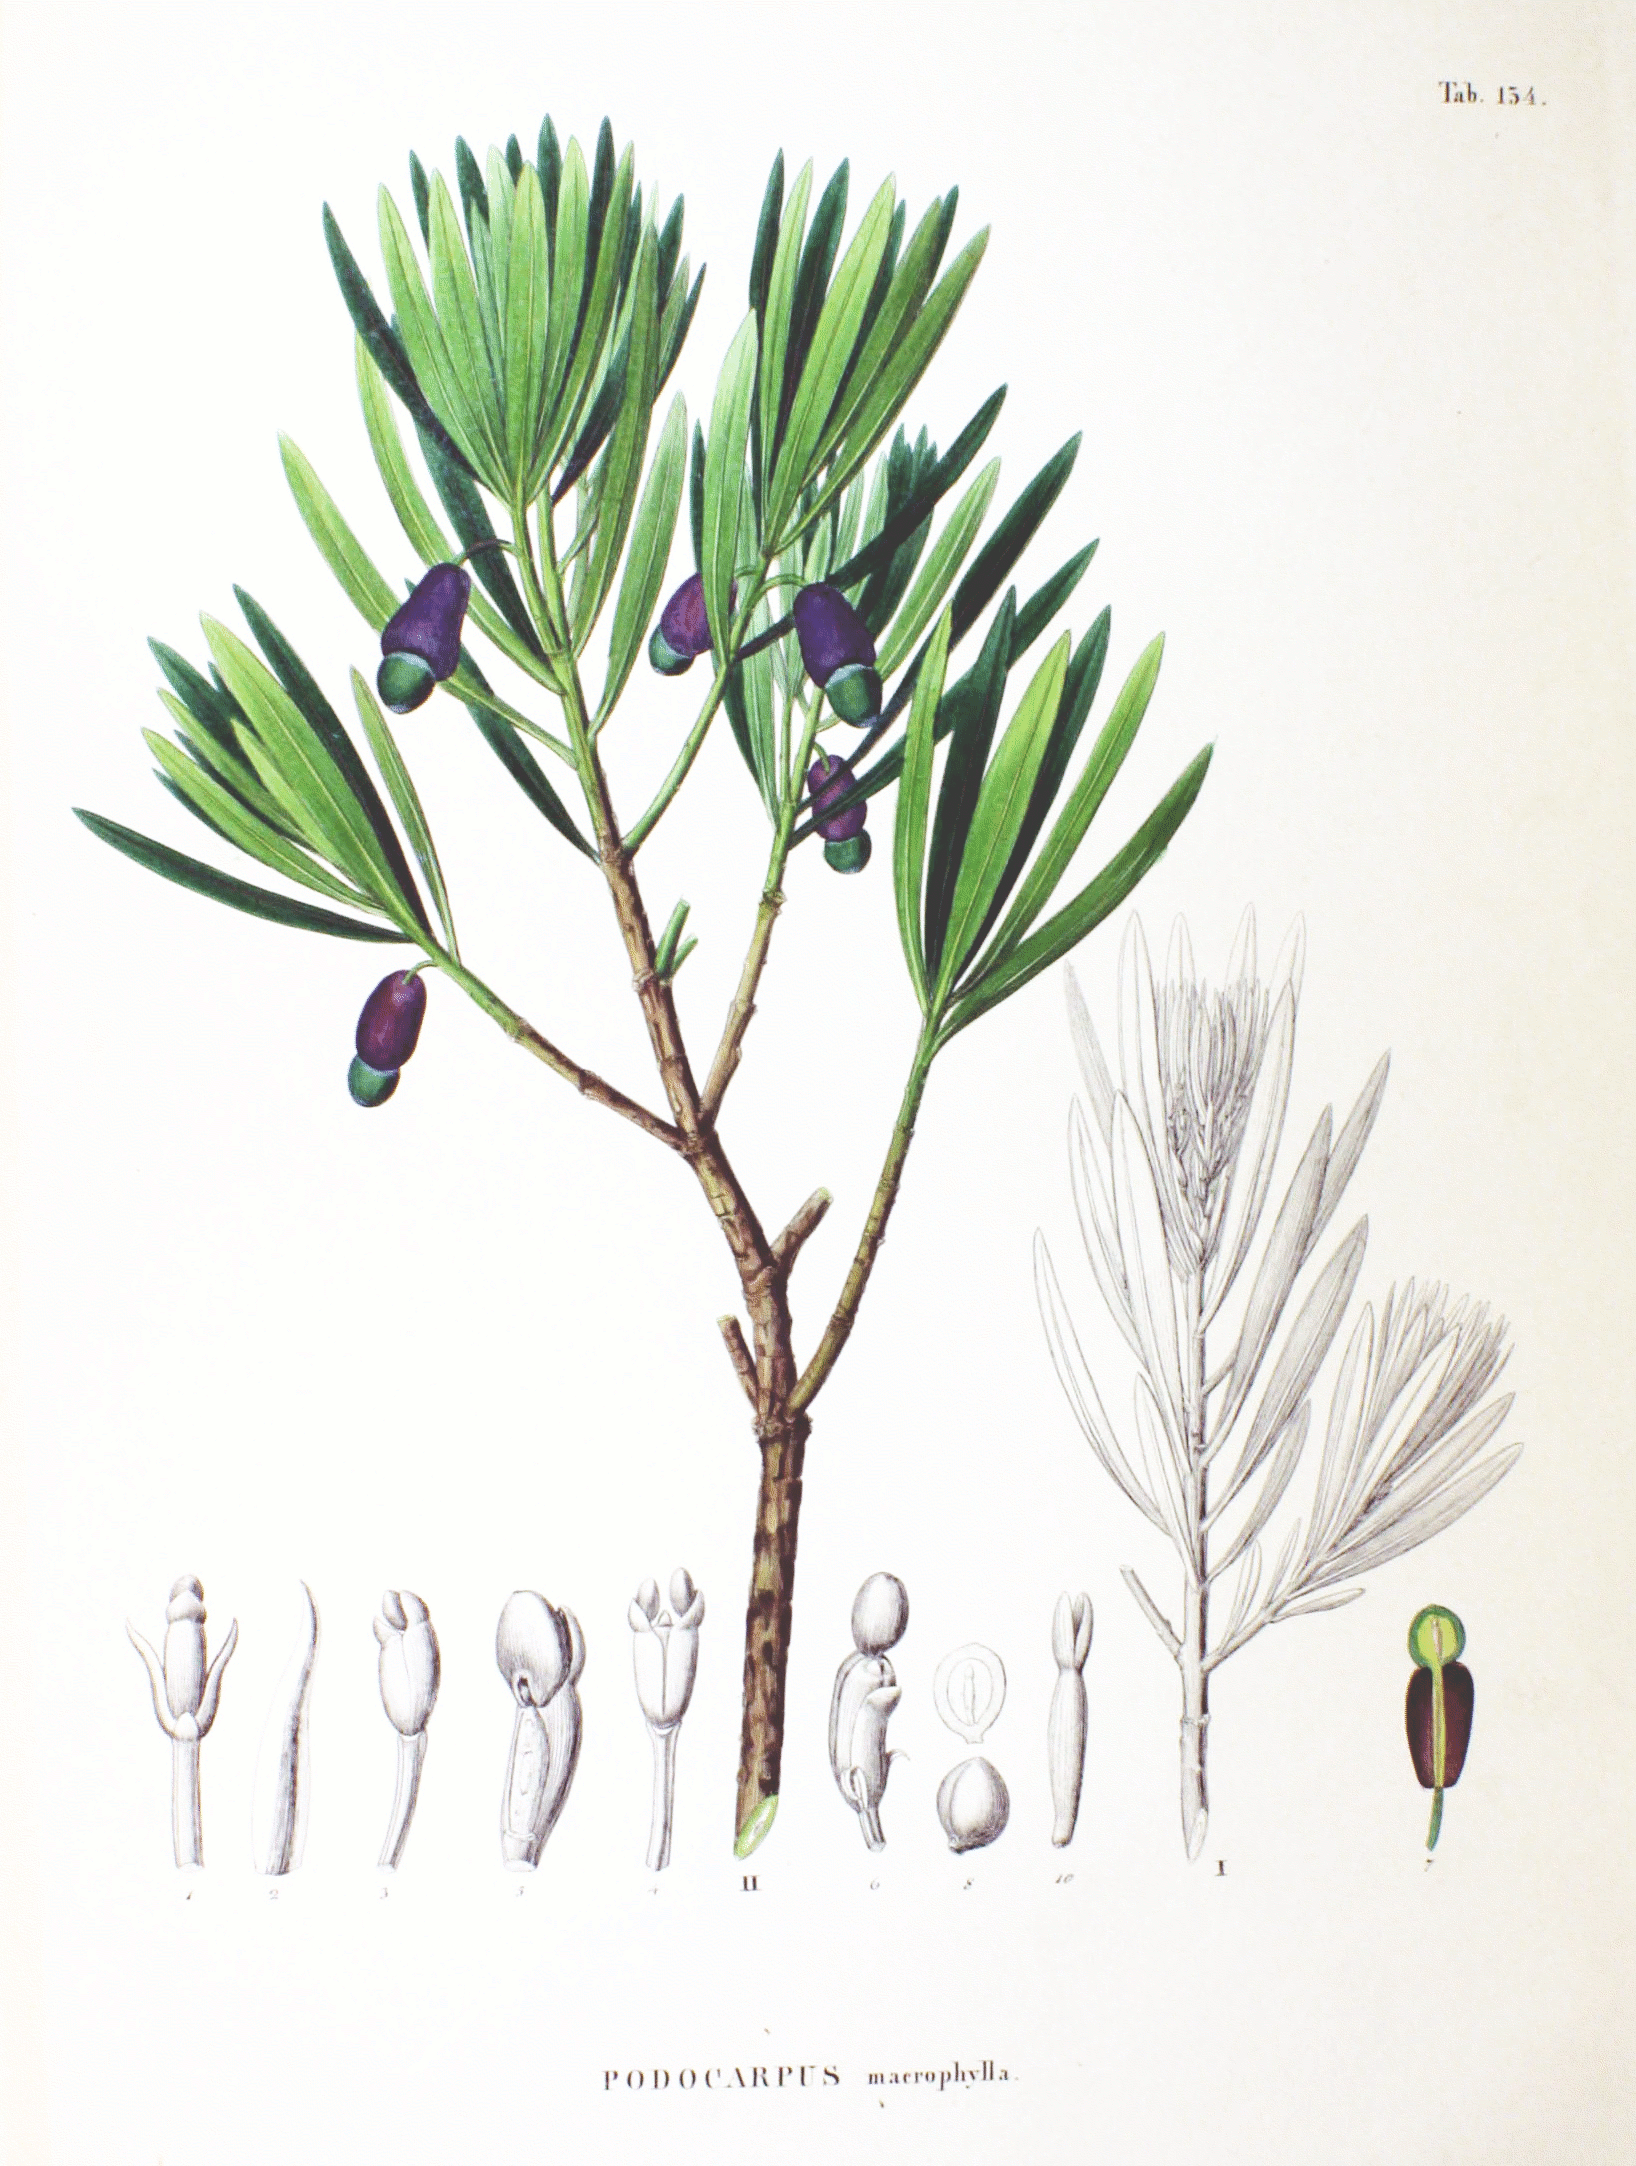 Depiction of Podocarpaceae